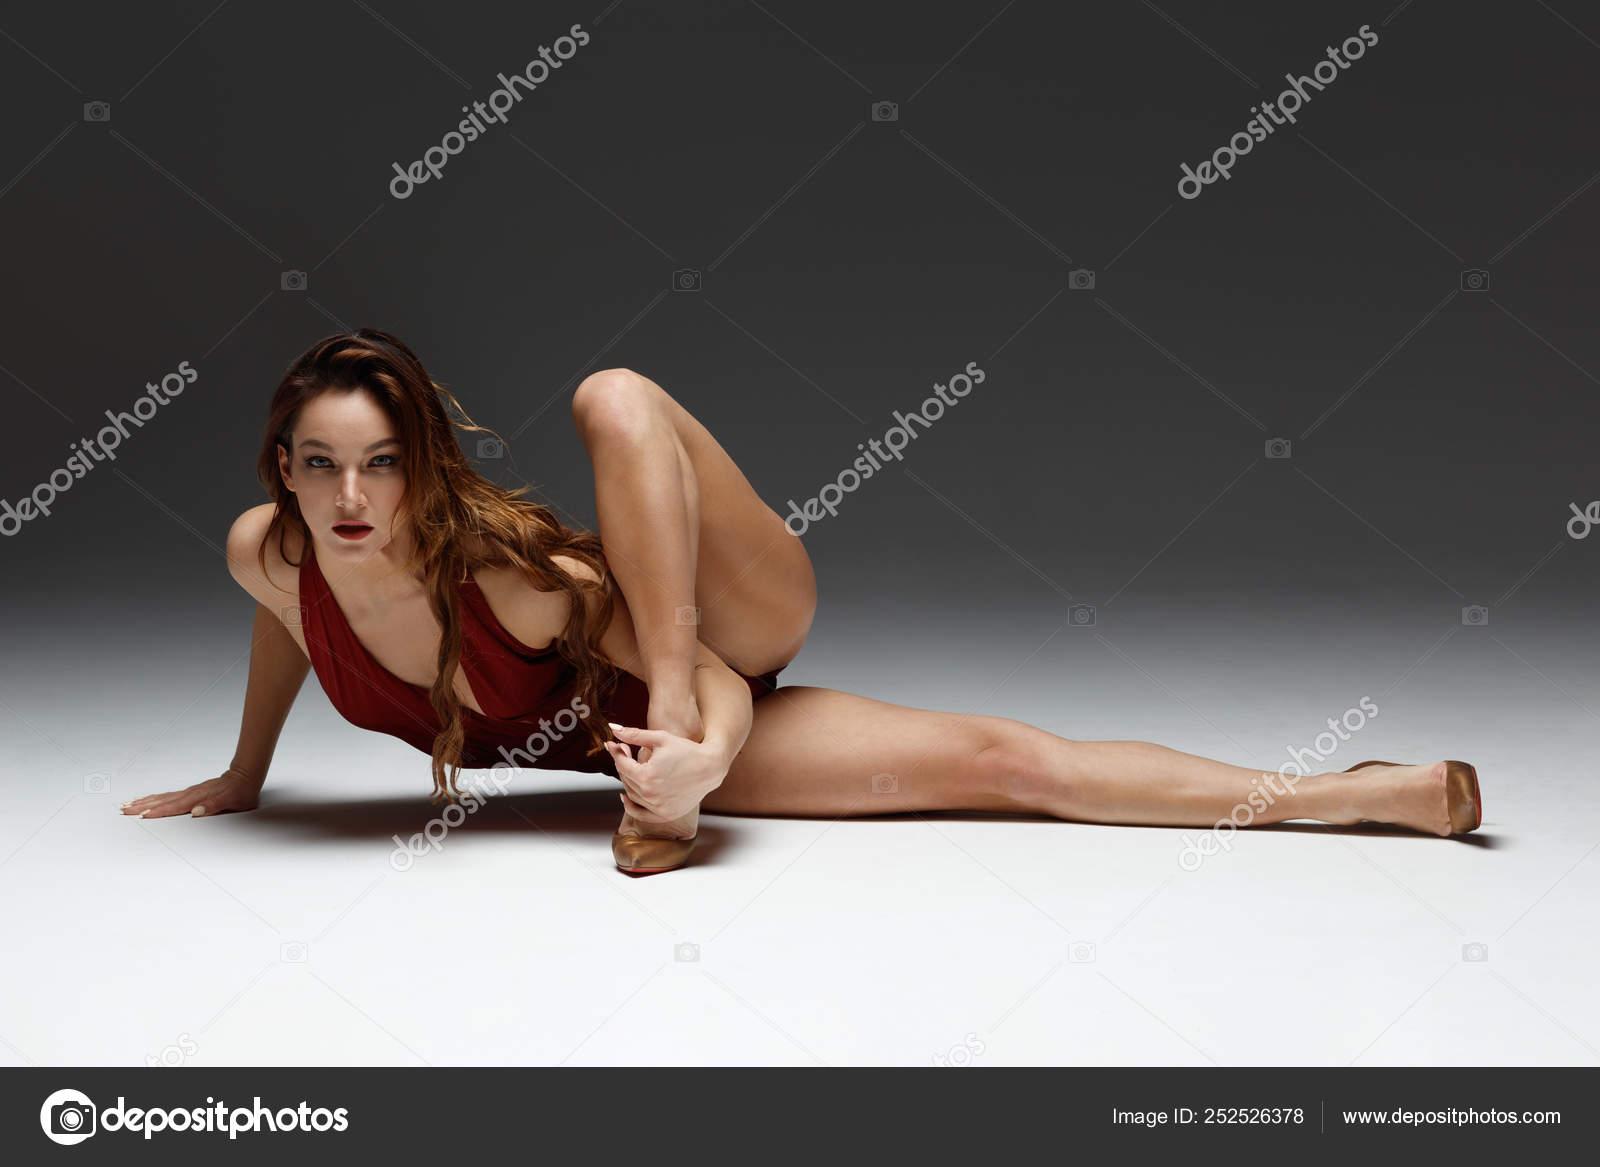 Female Striptease